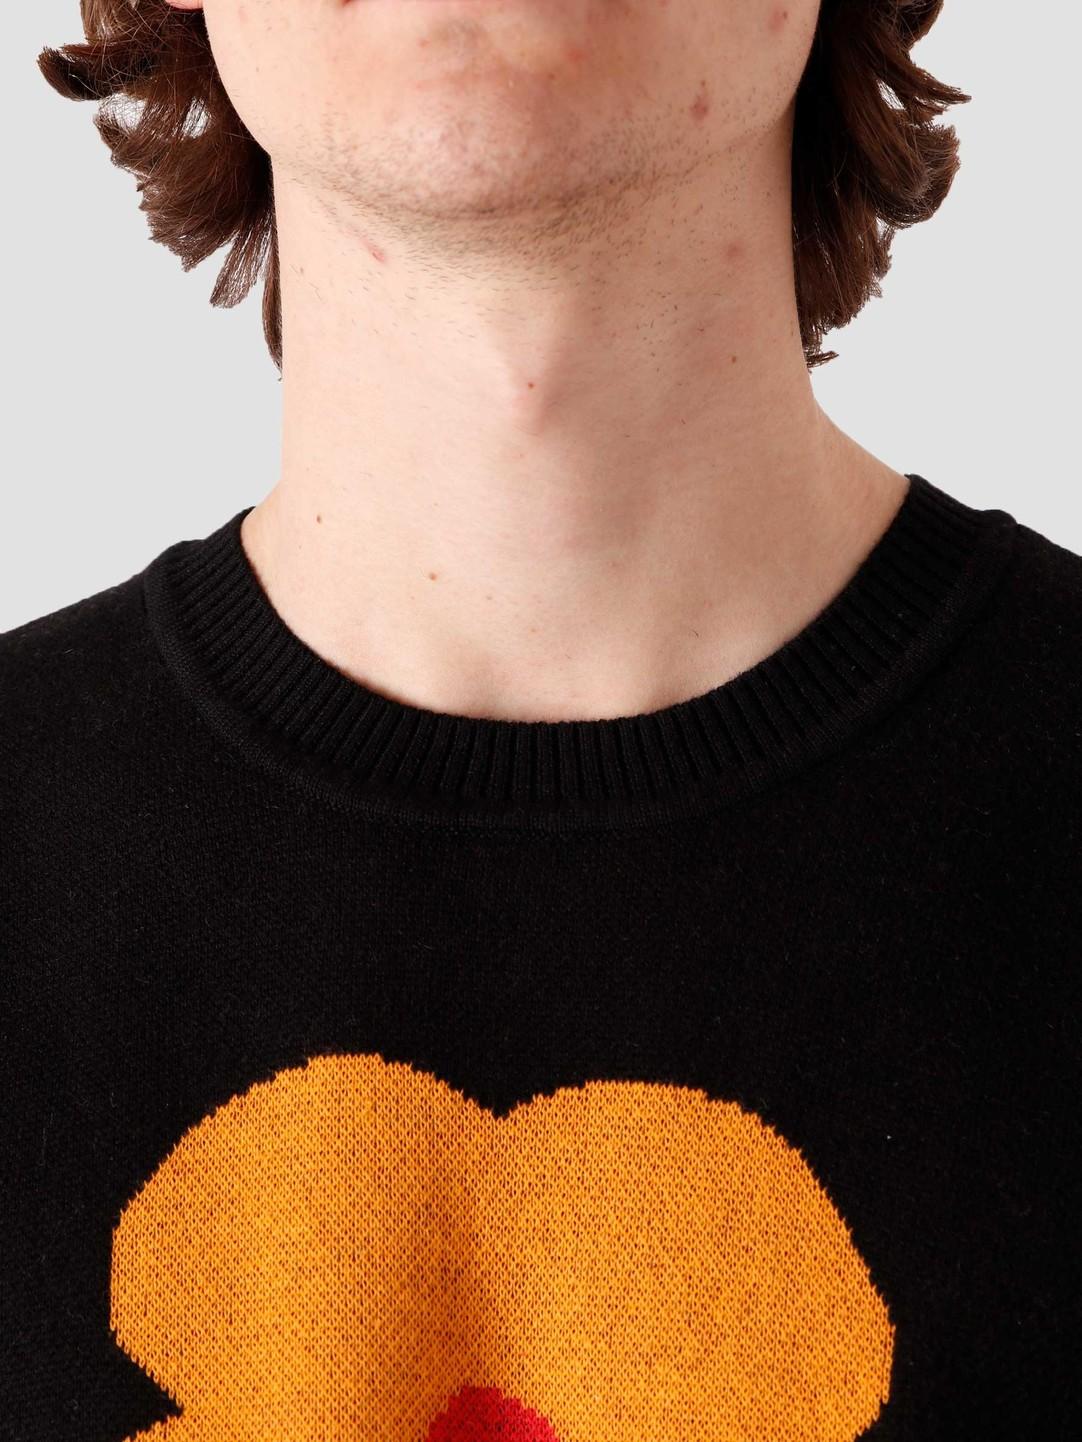 Obey Obey Traces Sweater Black Multi 151000052-BKM